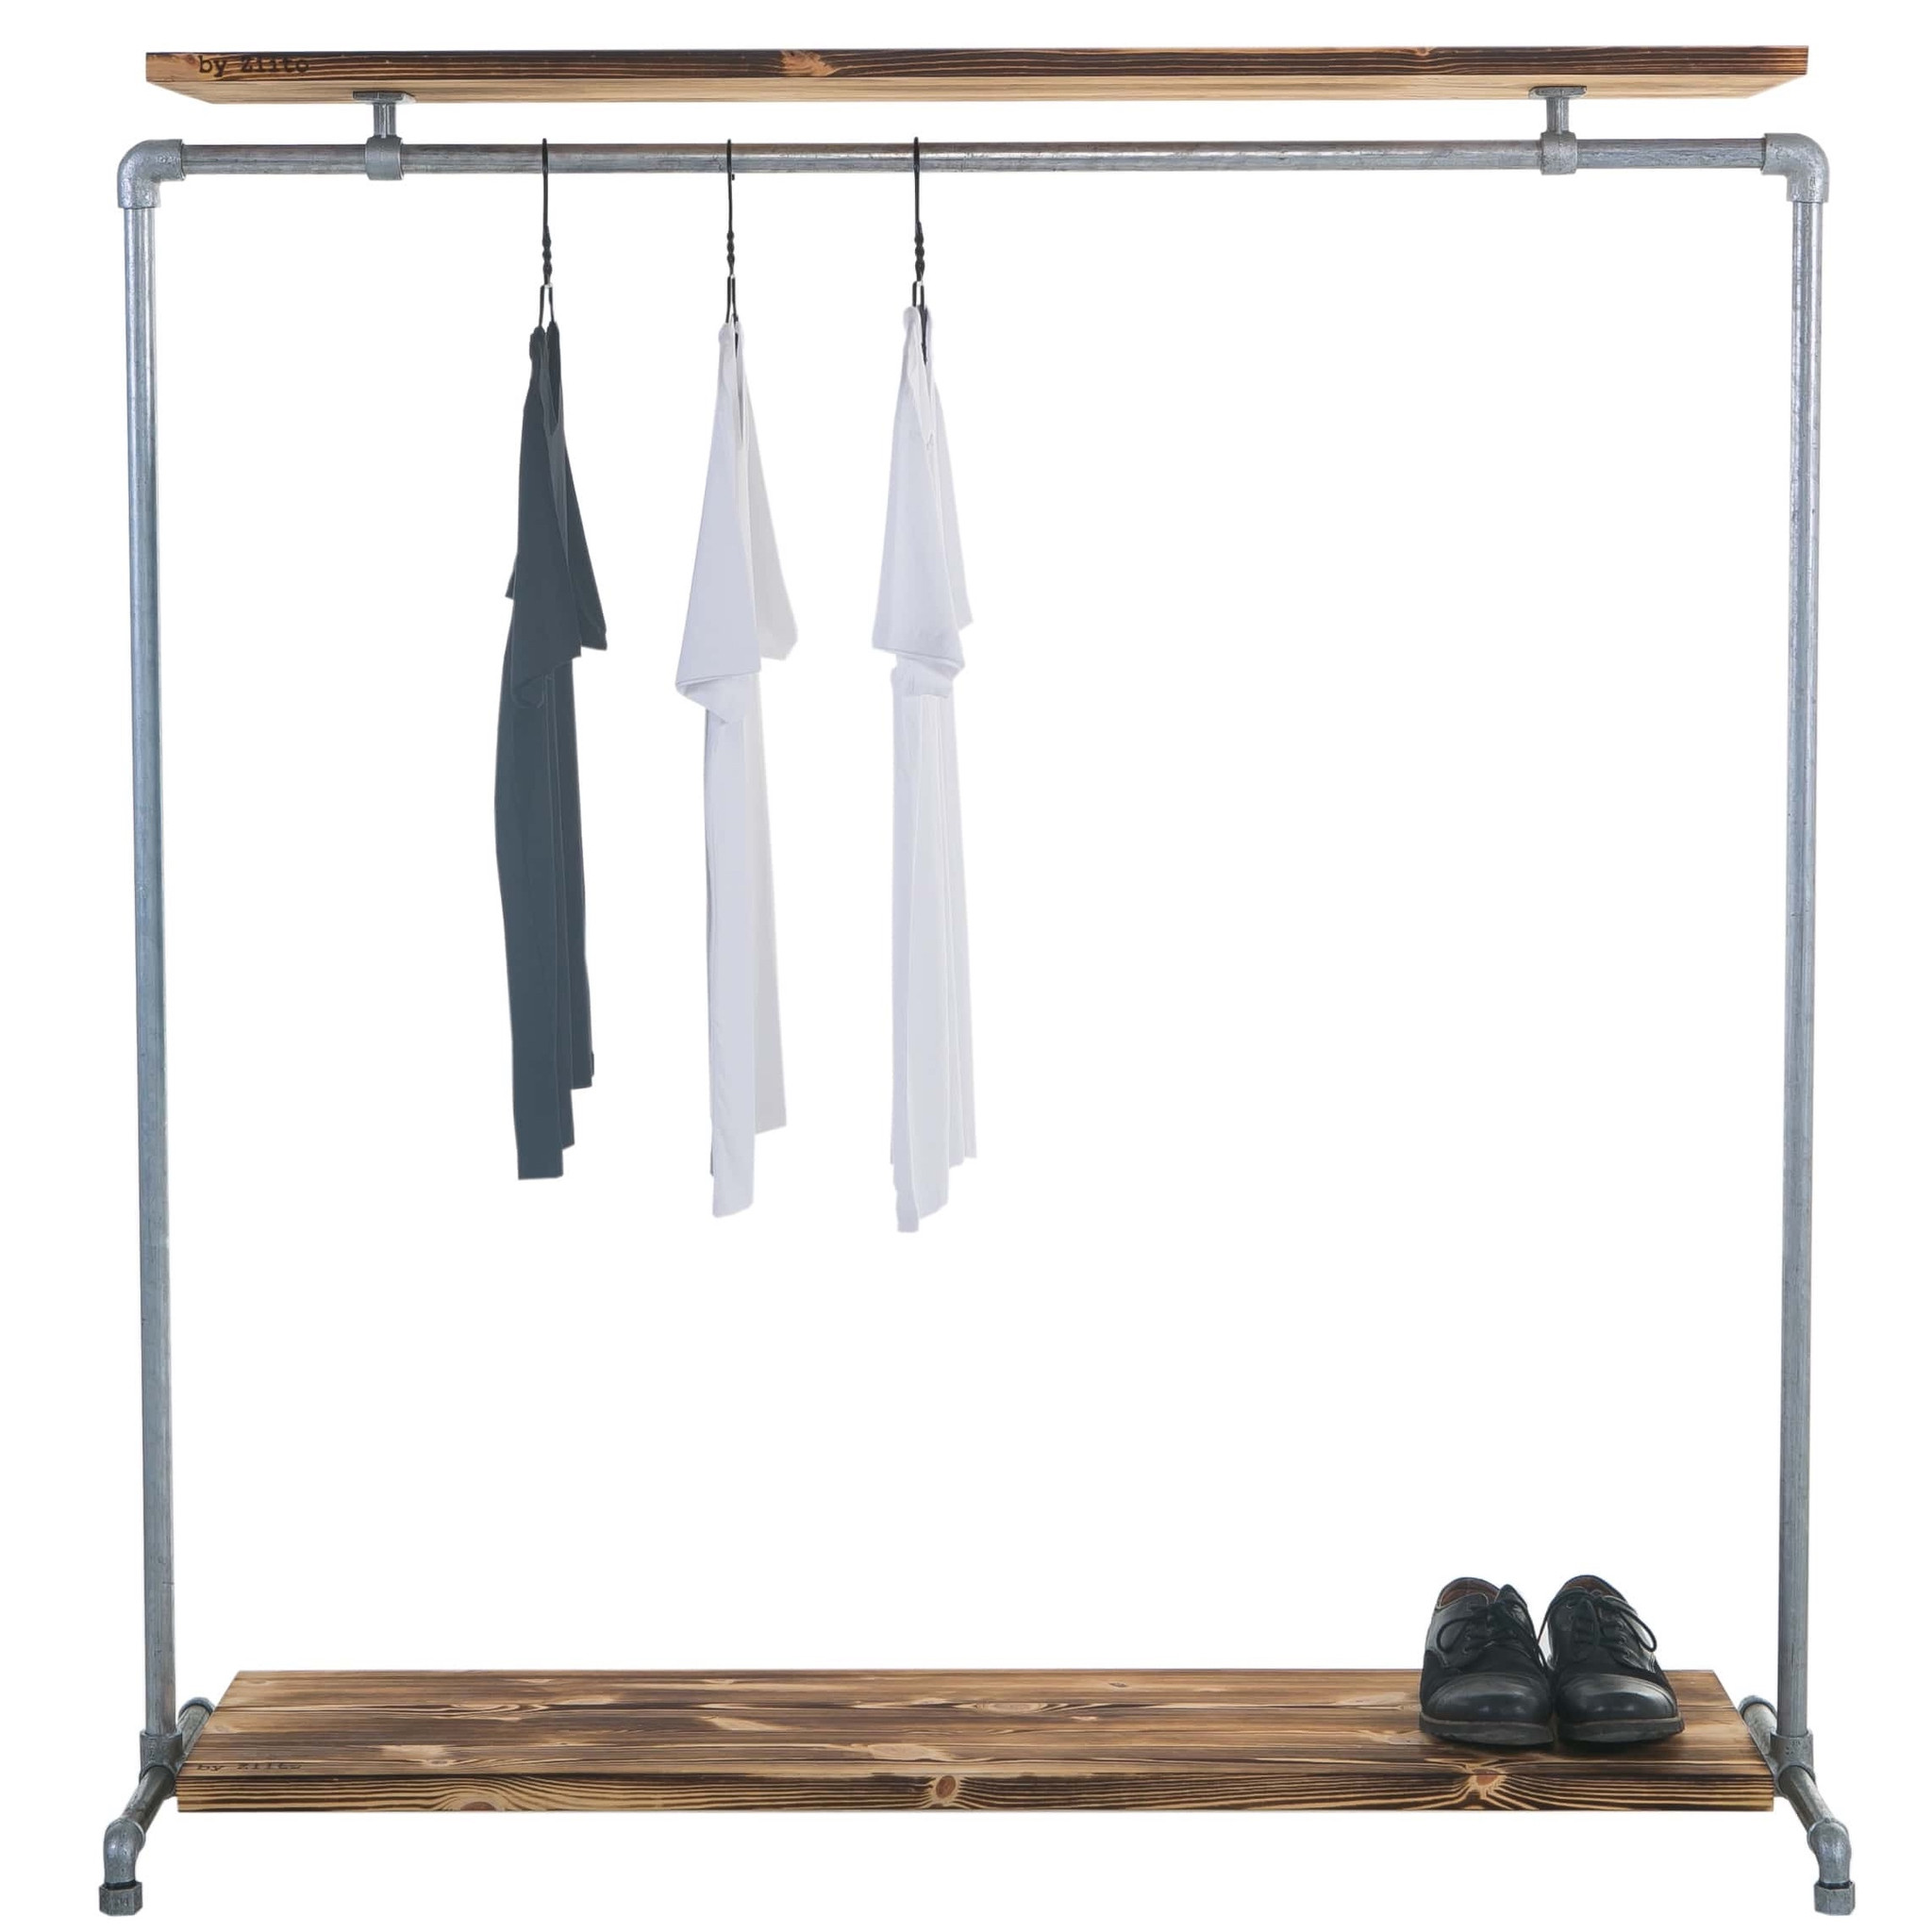 Clothes_rail_Wood_Double_Shelf_1.5.1-min